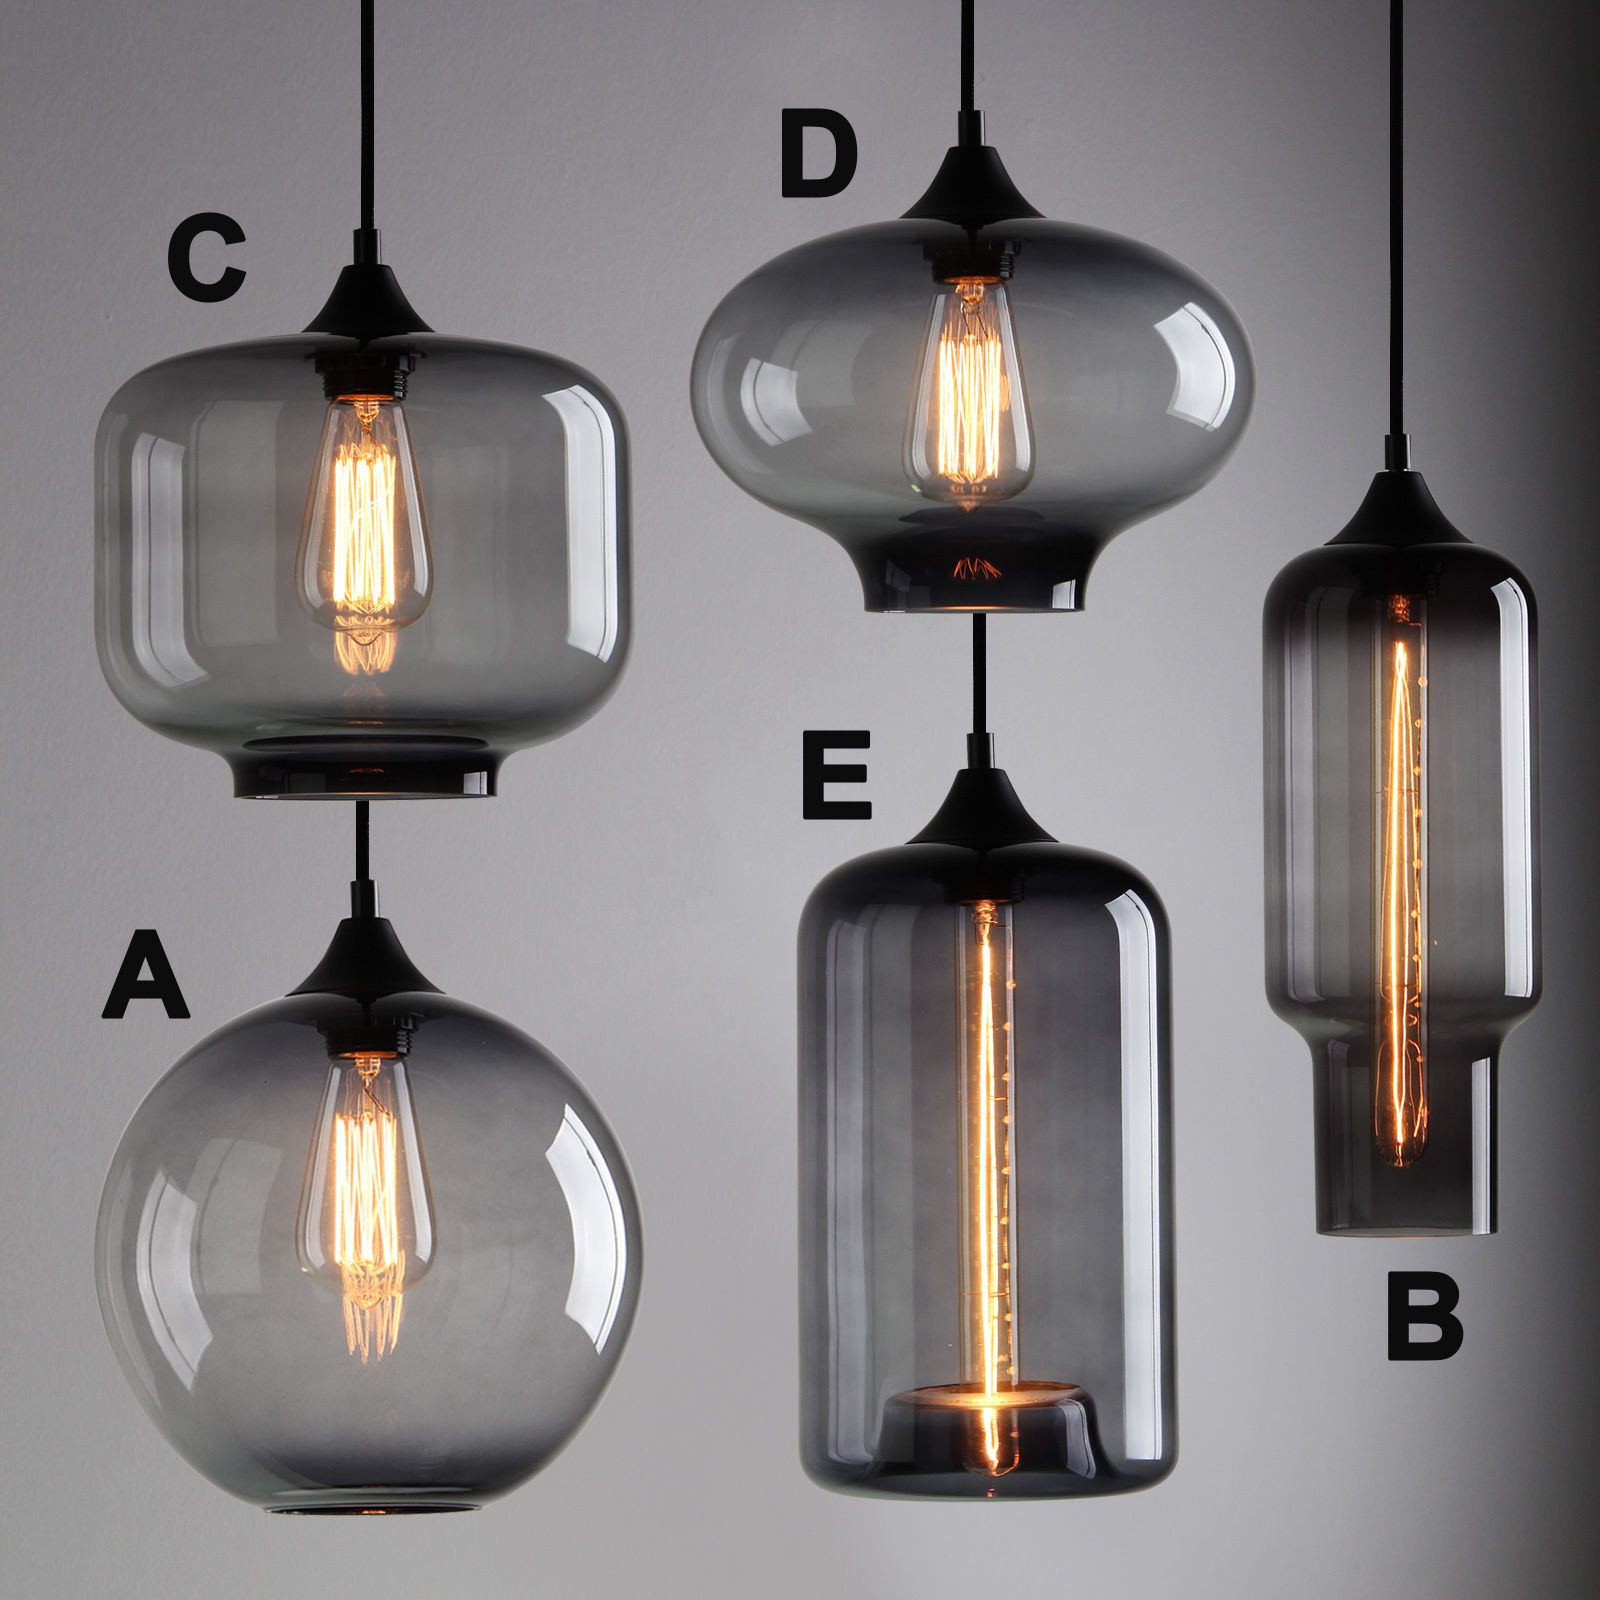 Bathroom Lighting Fixtures Ebay modern industrial smoky grey glass shade loft cafe pendant light